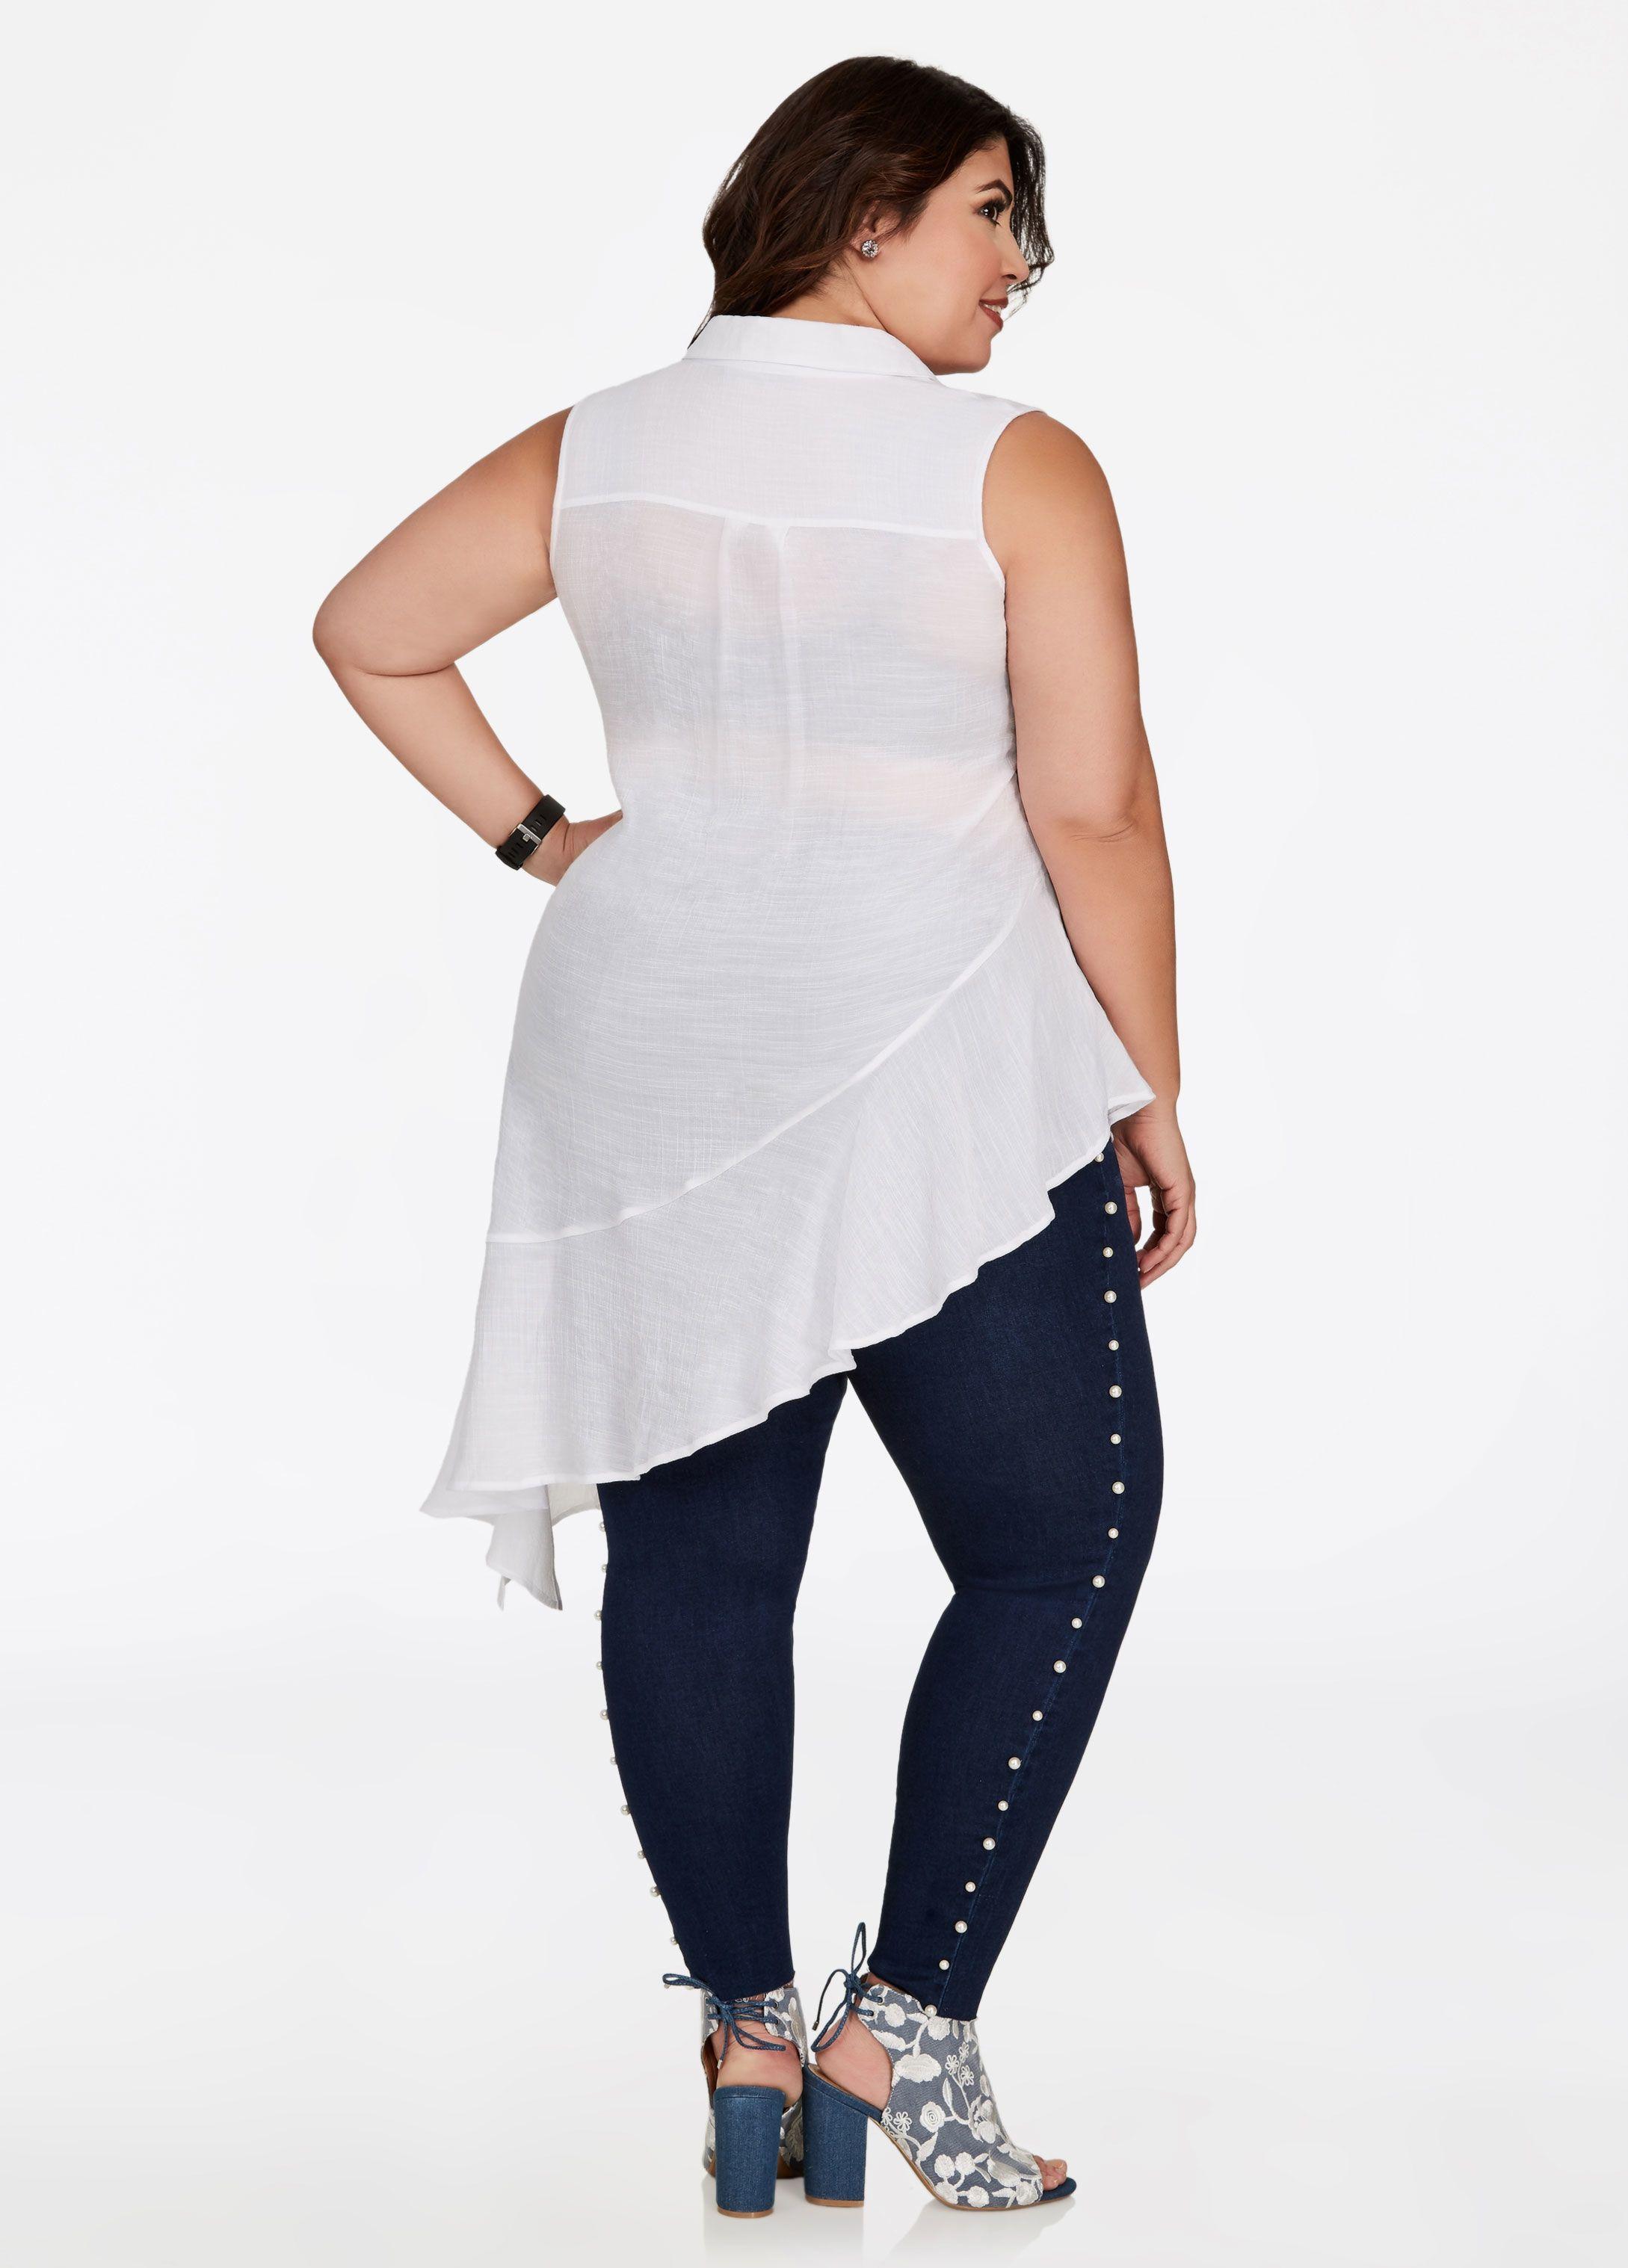 df0b13de Sleeveless Asymmetrical Top - Ashley Stewart. Sleeveless Asymmetrical Top -  Ashley Stewart Plus Size Peplum ...